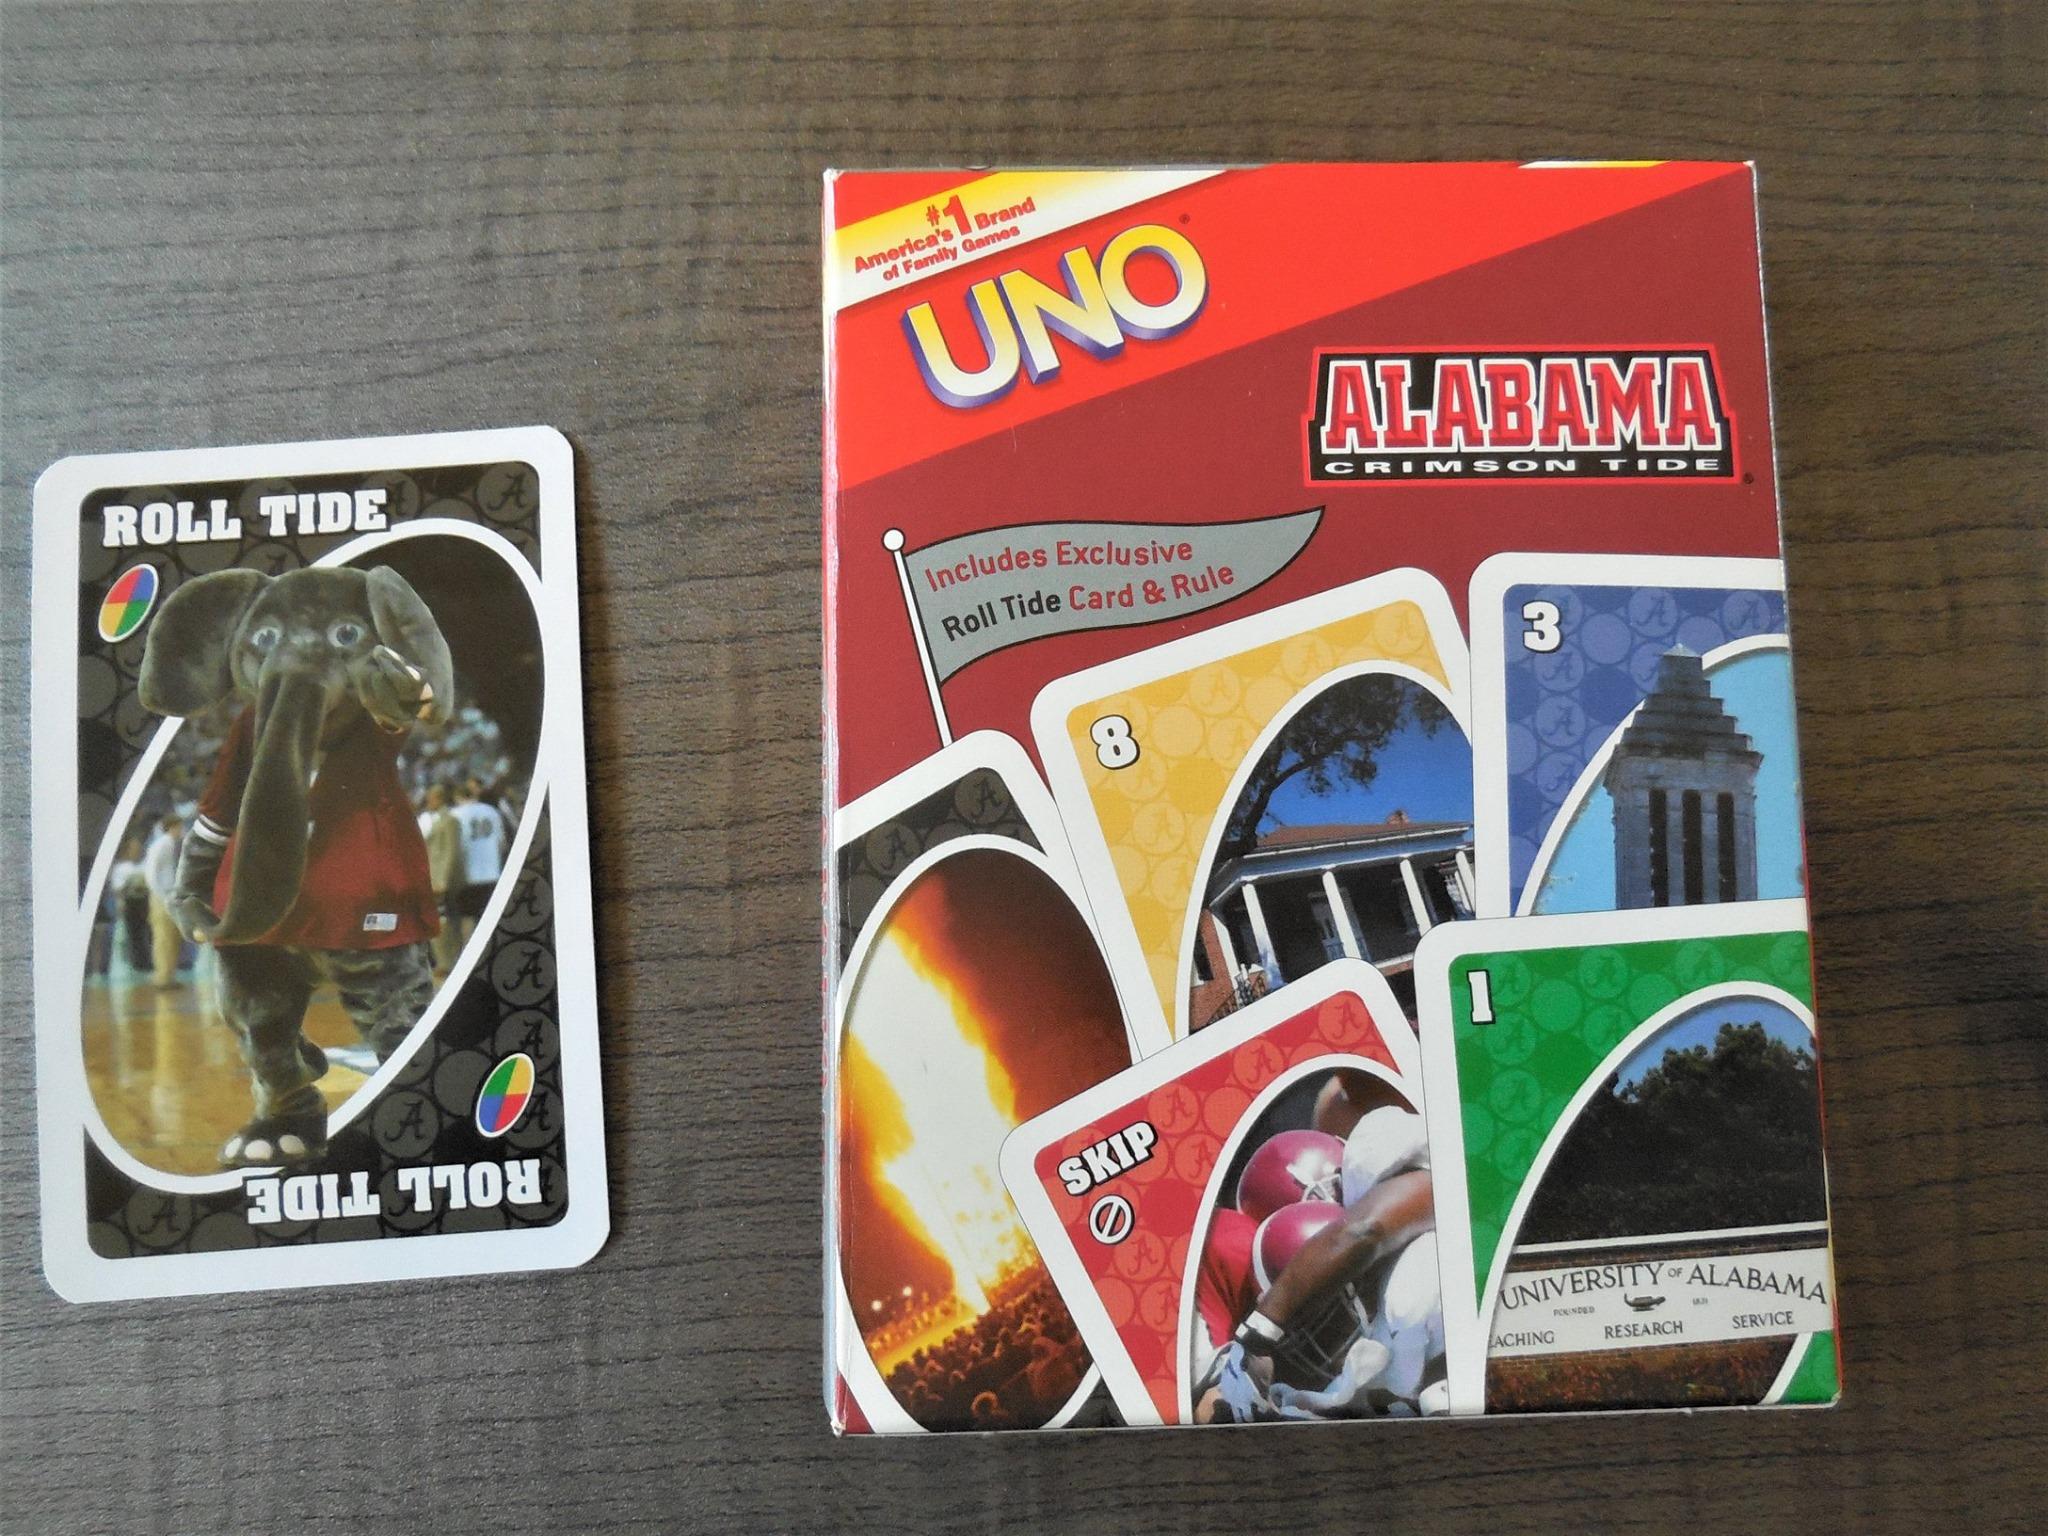 University of Alabama Uno Card Game